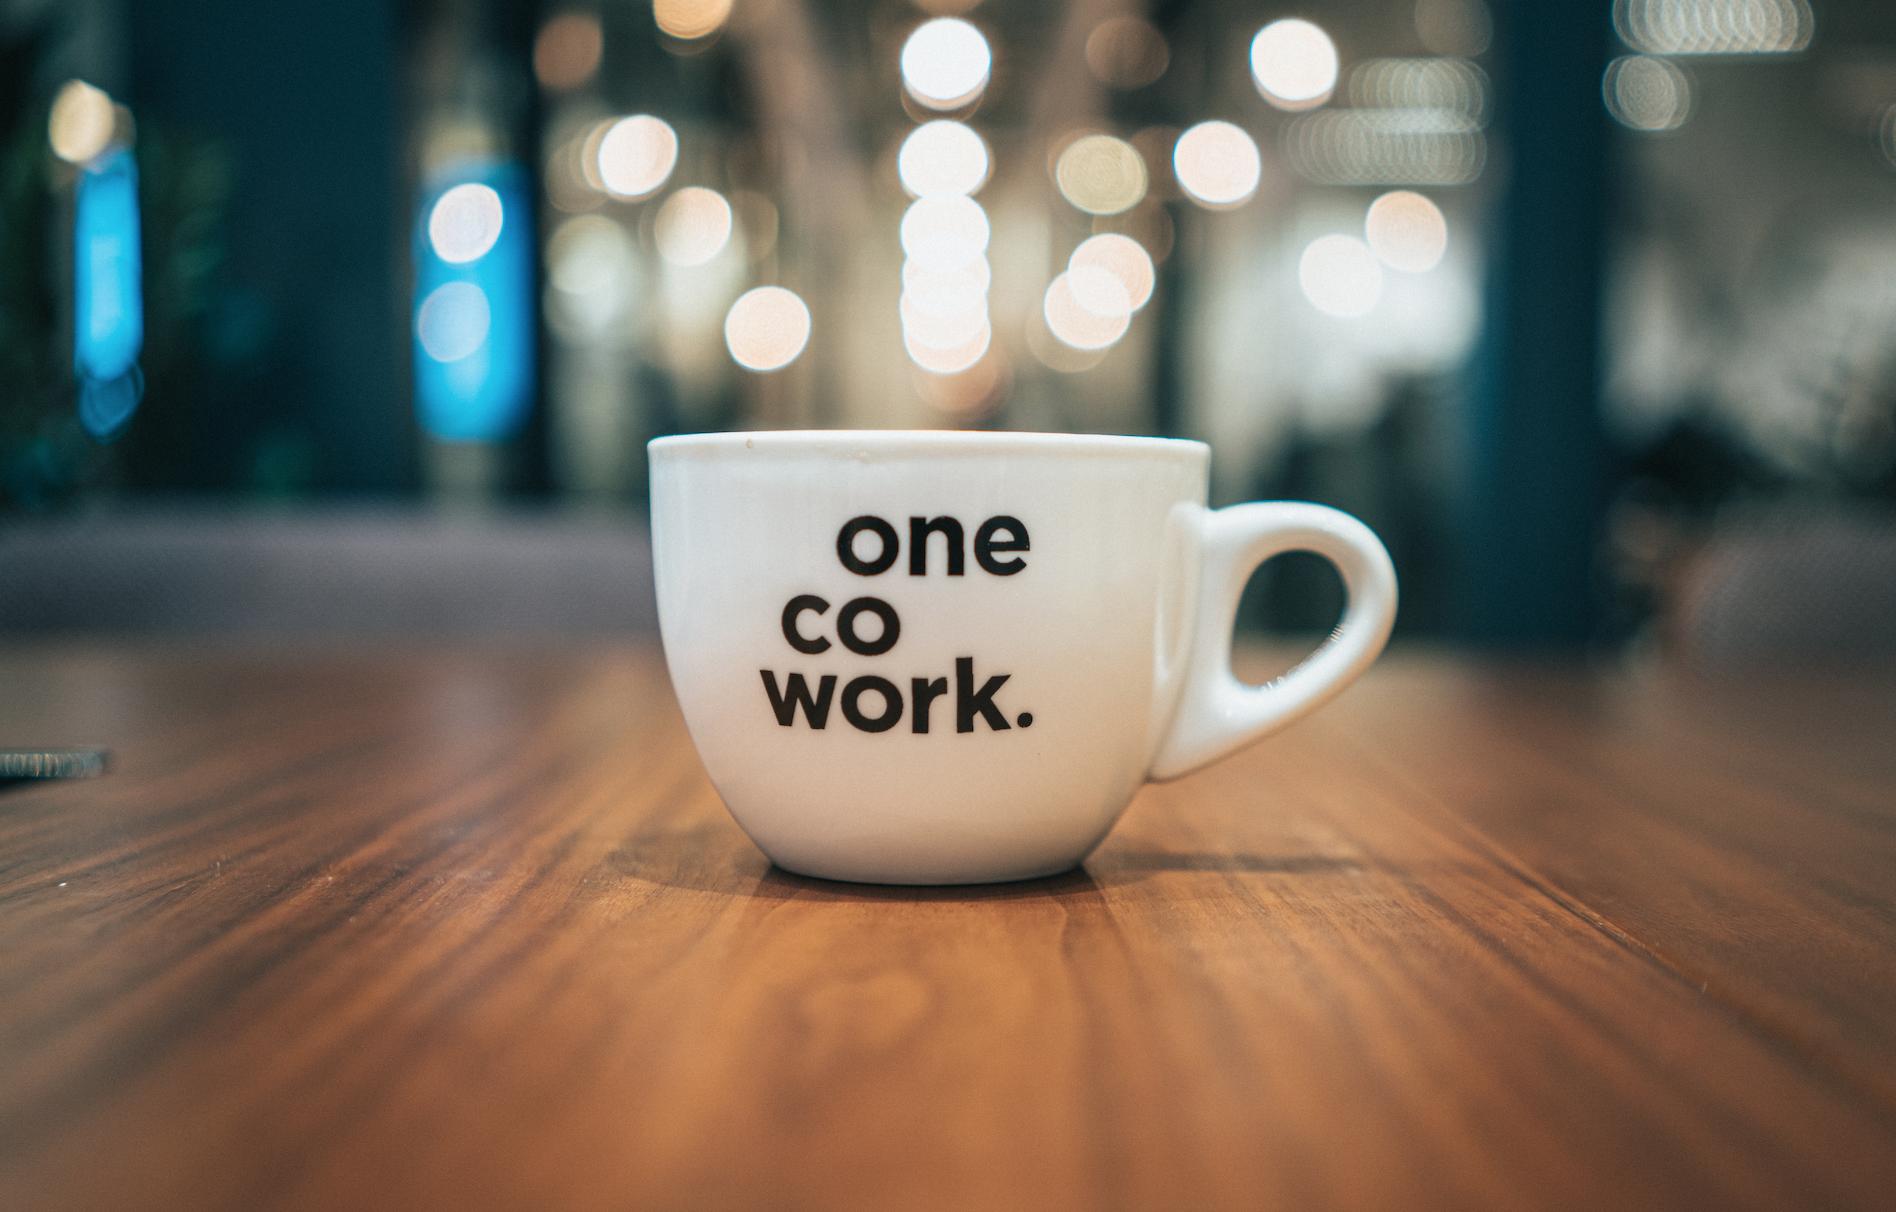 onecowork coffee